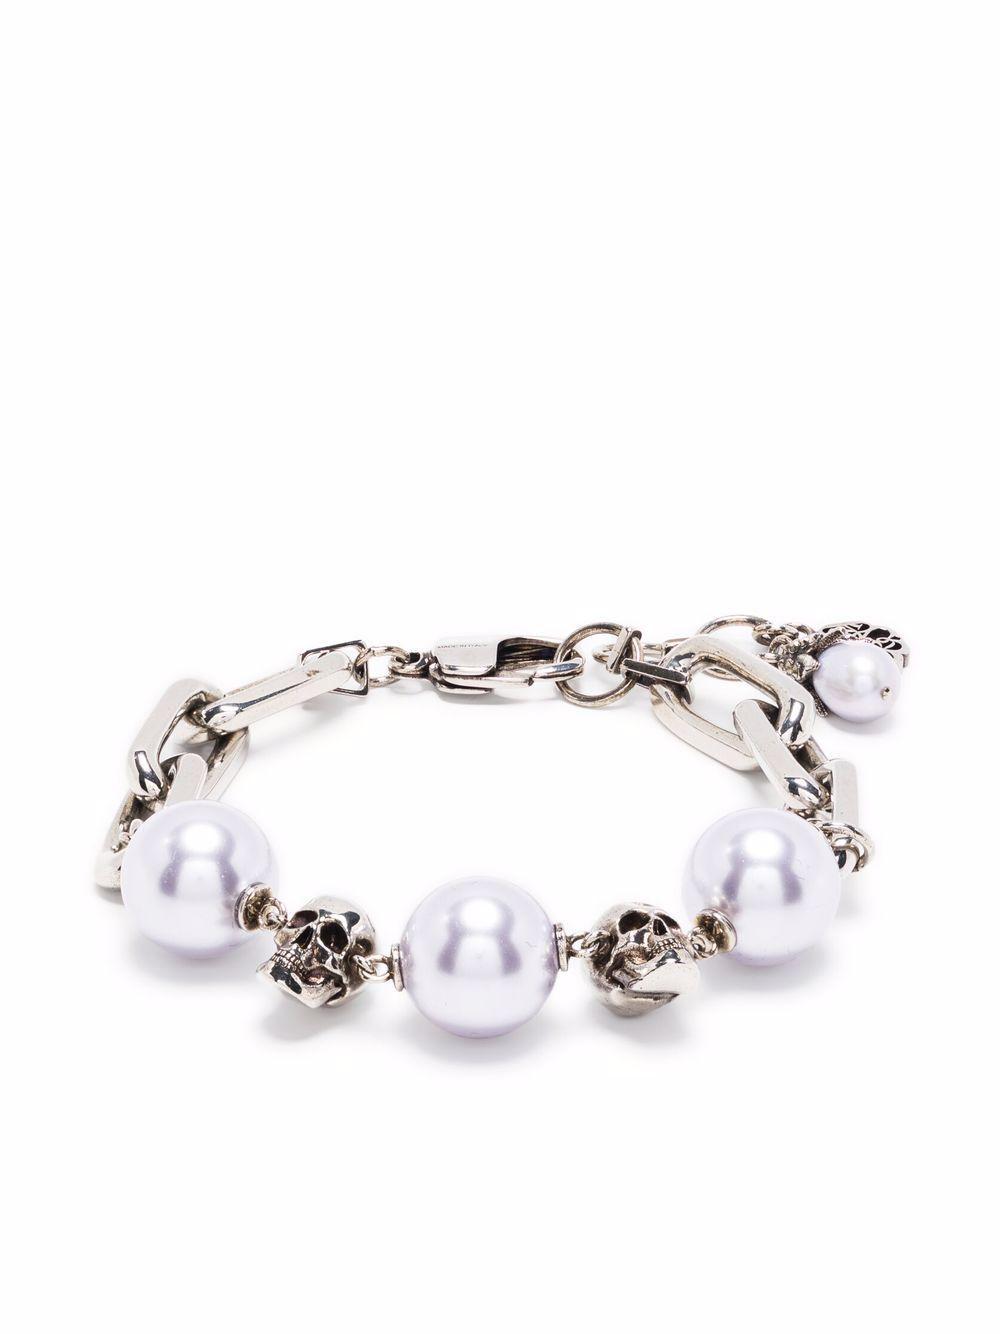 Bracciale con perle e teschi